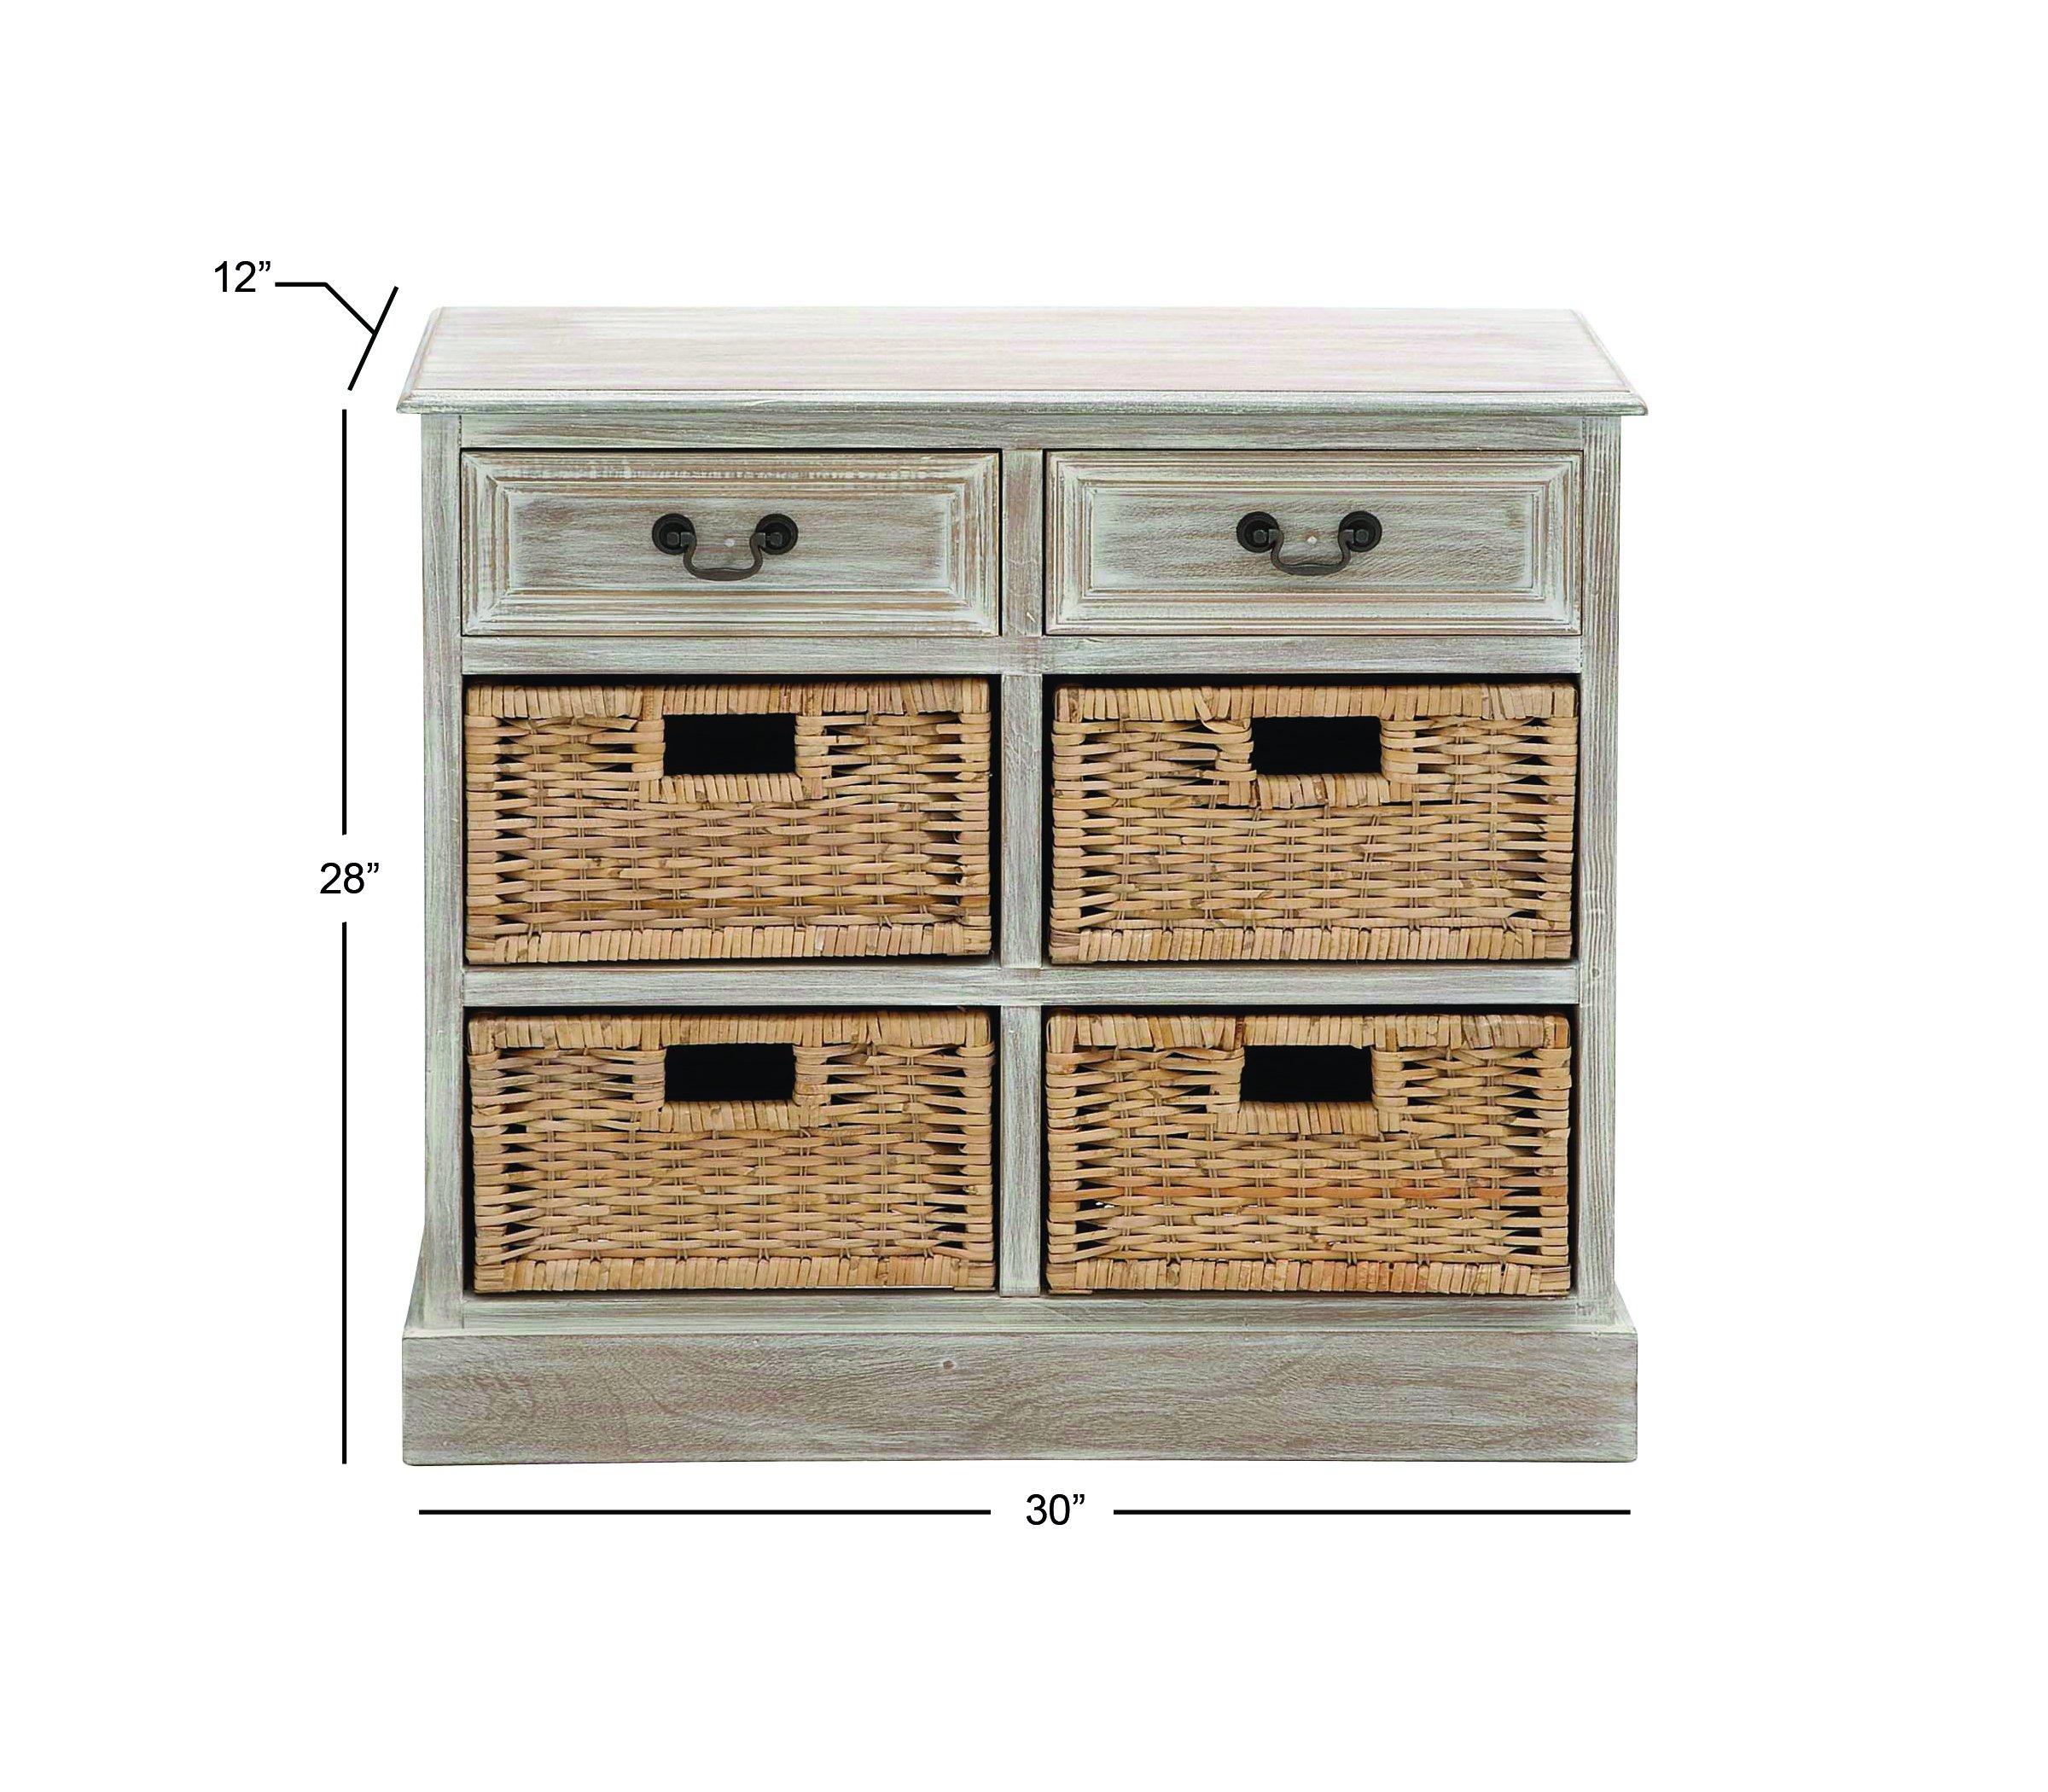 Deco 79 96285 Wood 4 Basket Dresser, 30'' x 28'', Taupe